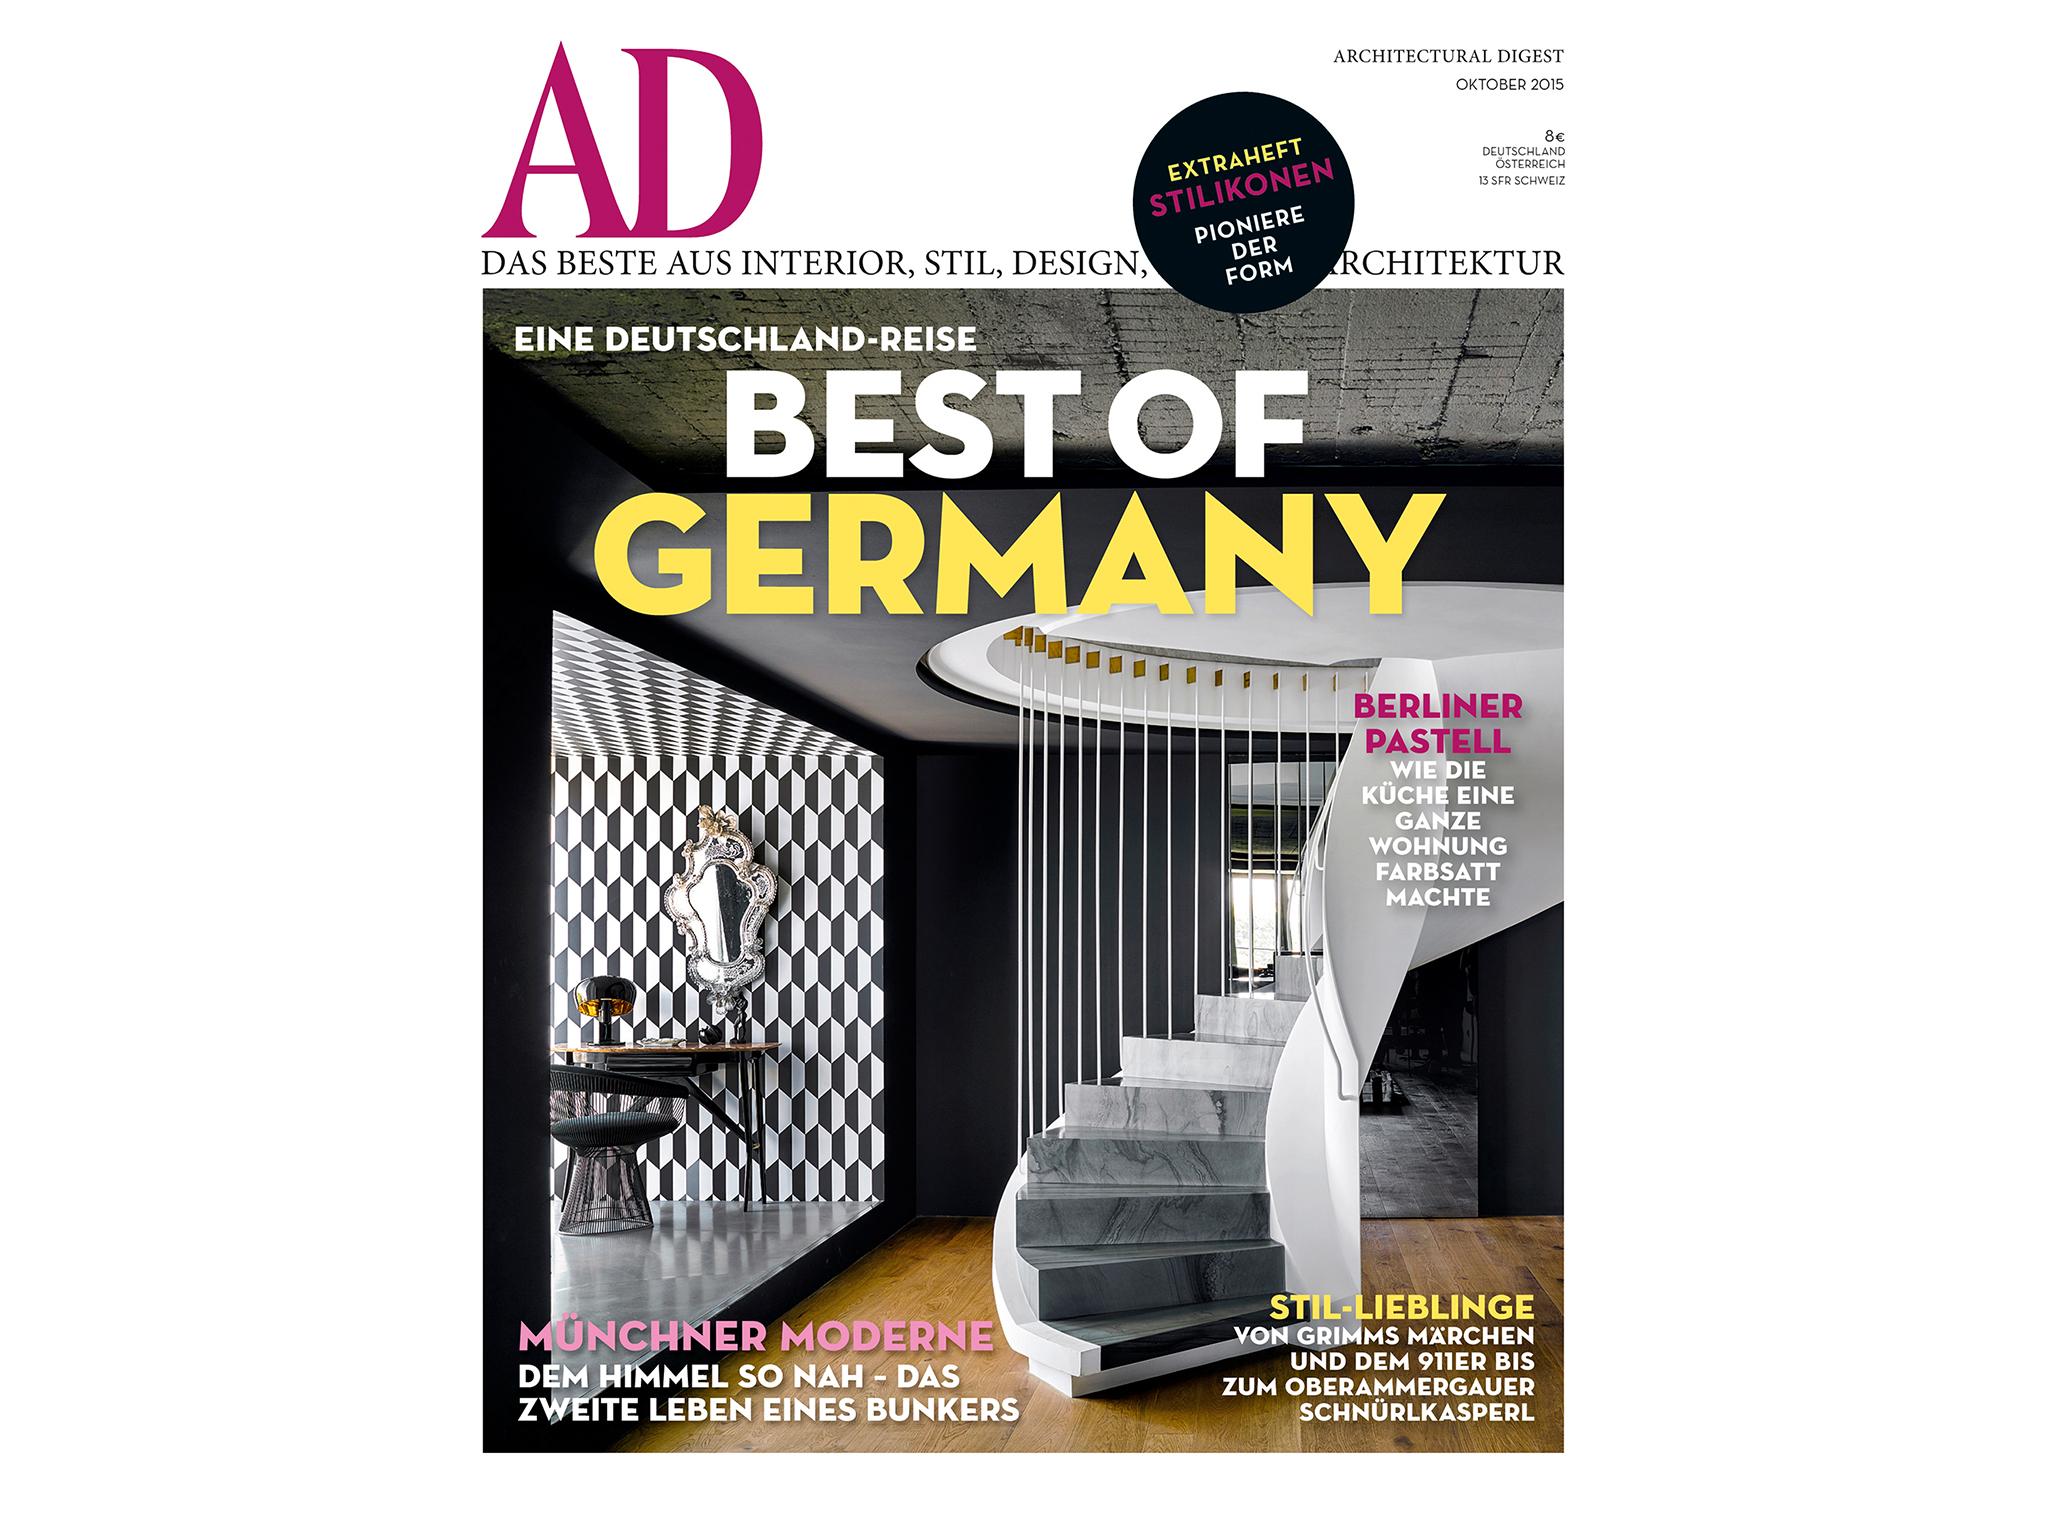 Ad Architectural Digest Tka